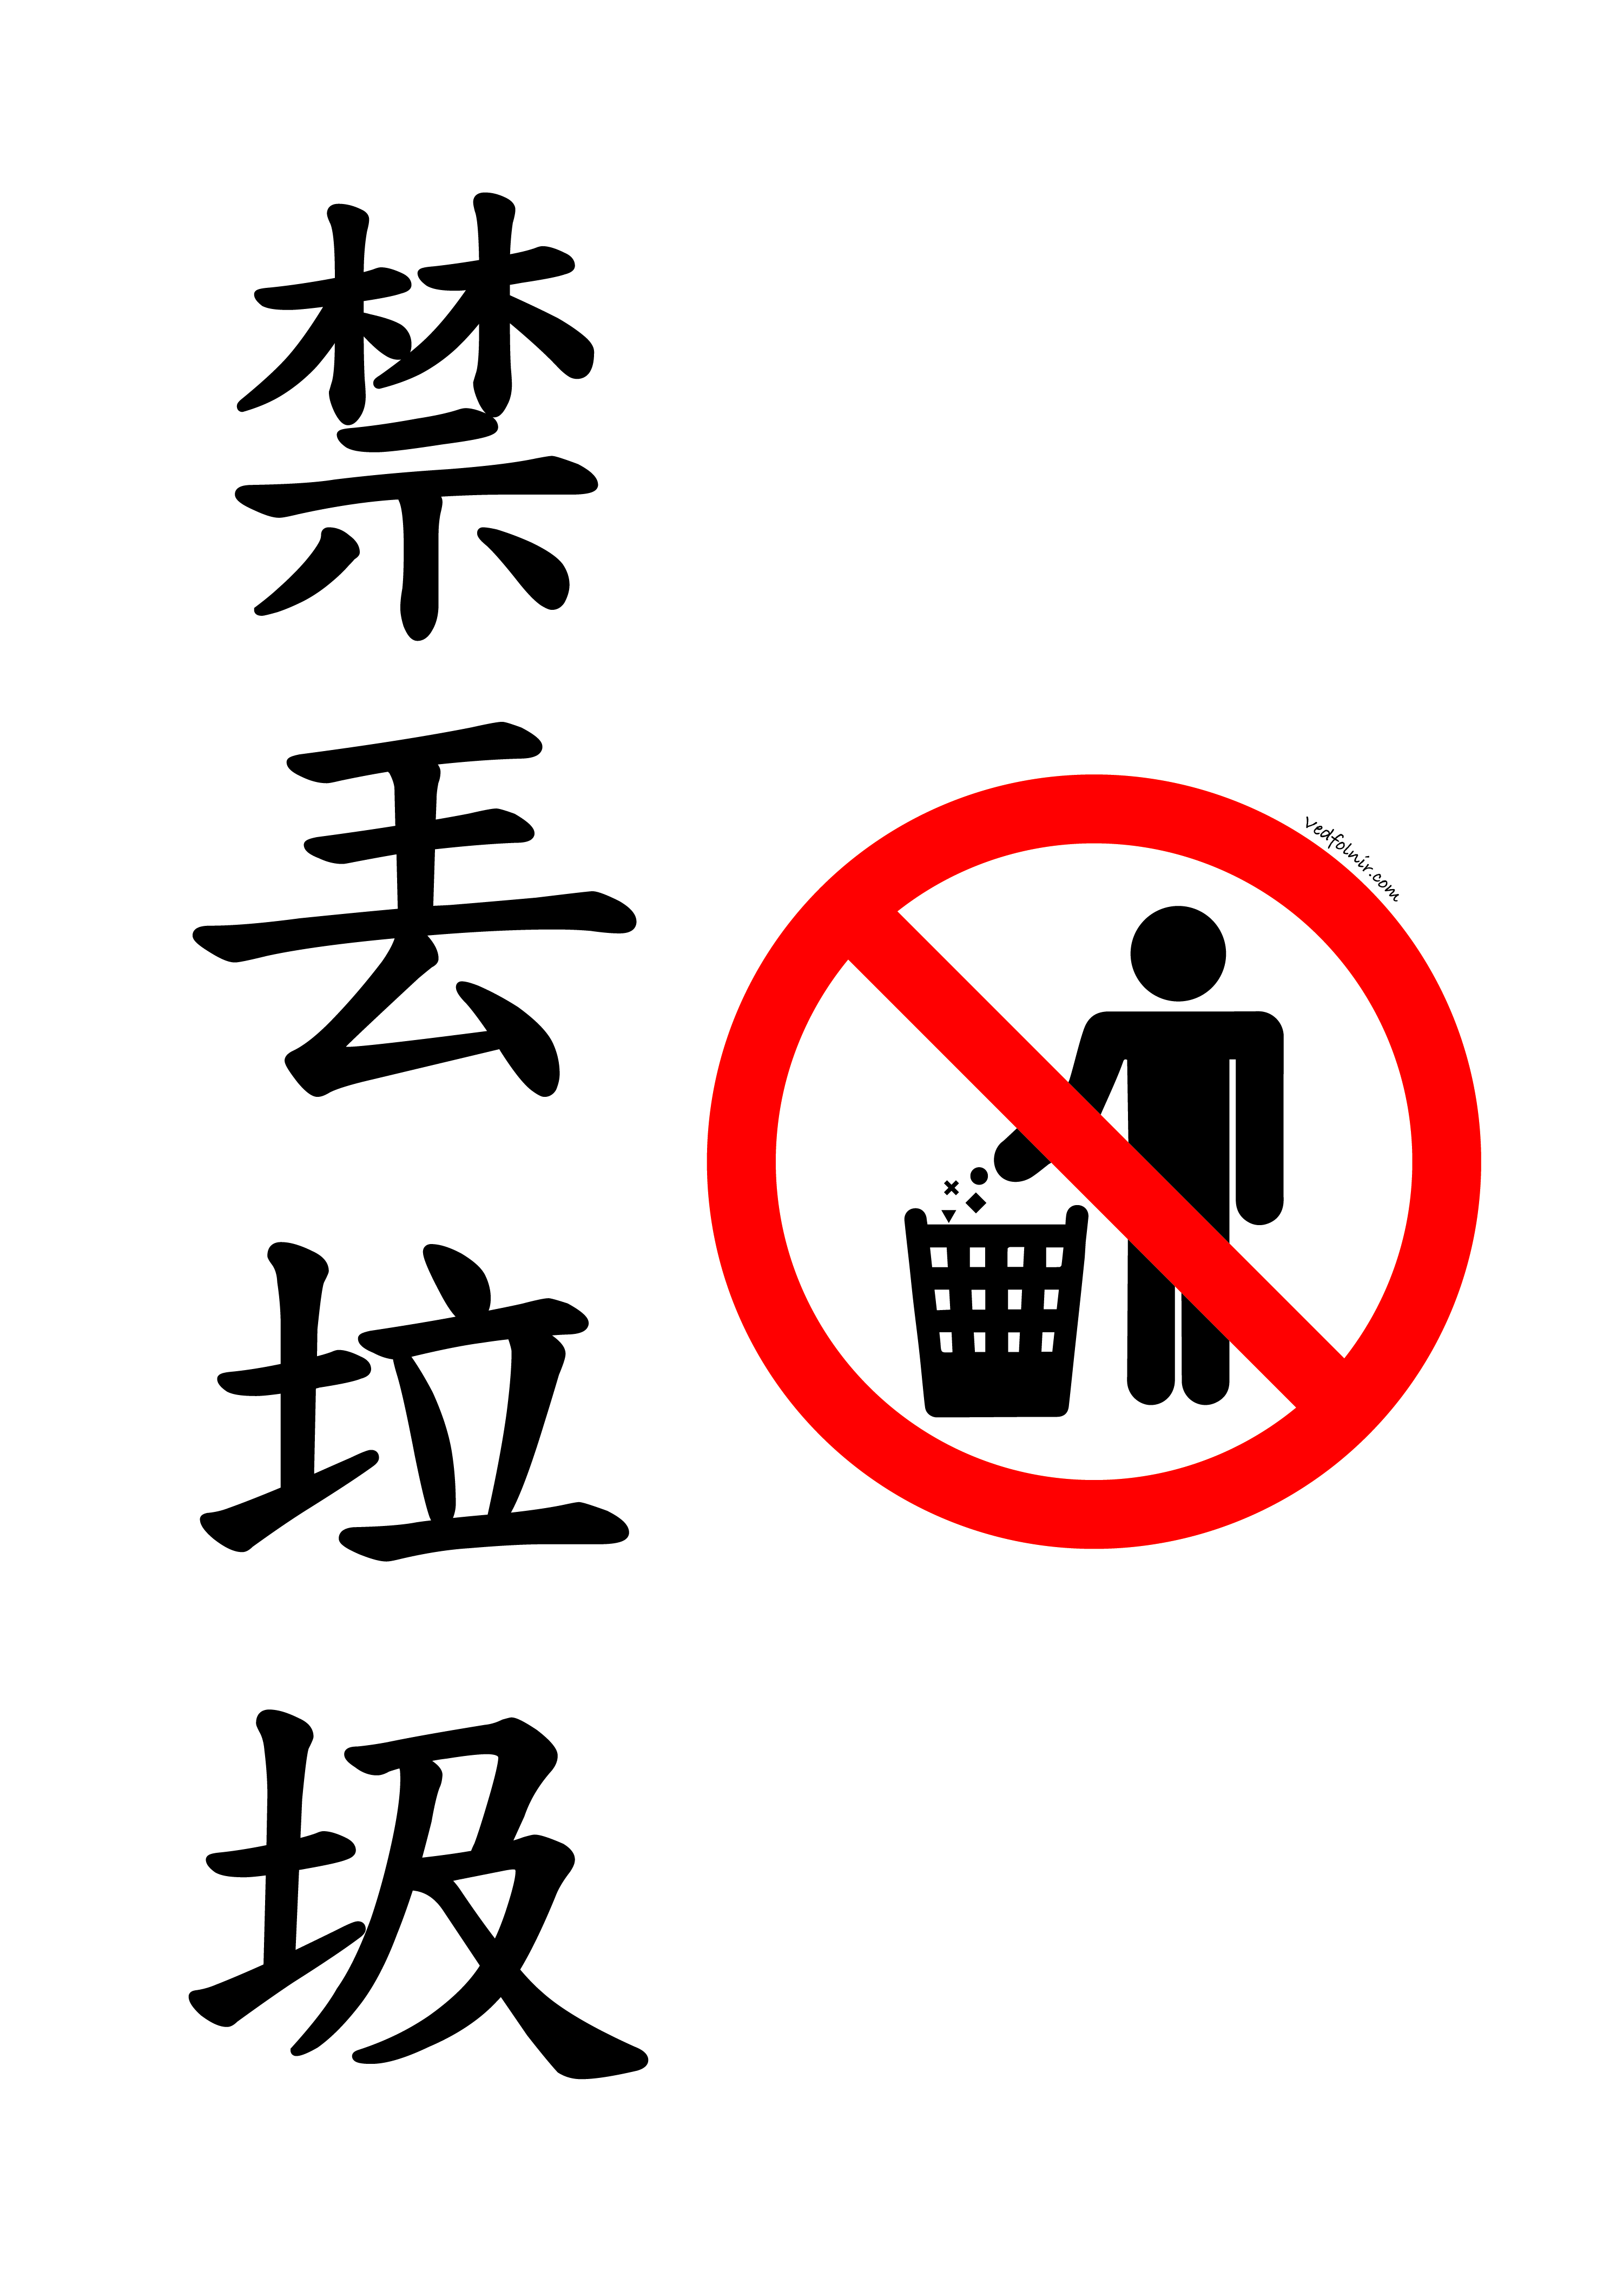 No littering Design Layout 01 「禁丟垃圾」與「垃圾🚫」圖樣 A4 紙印刷版(下載輸出列印)